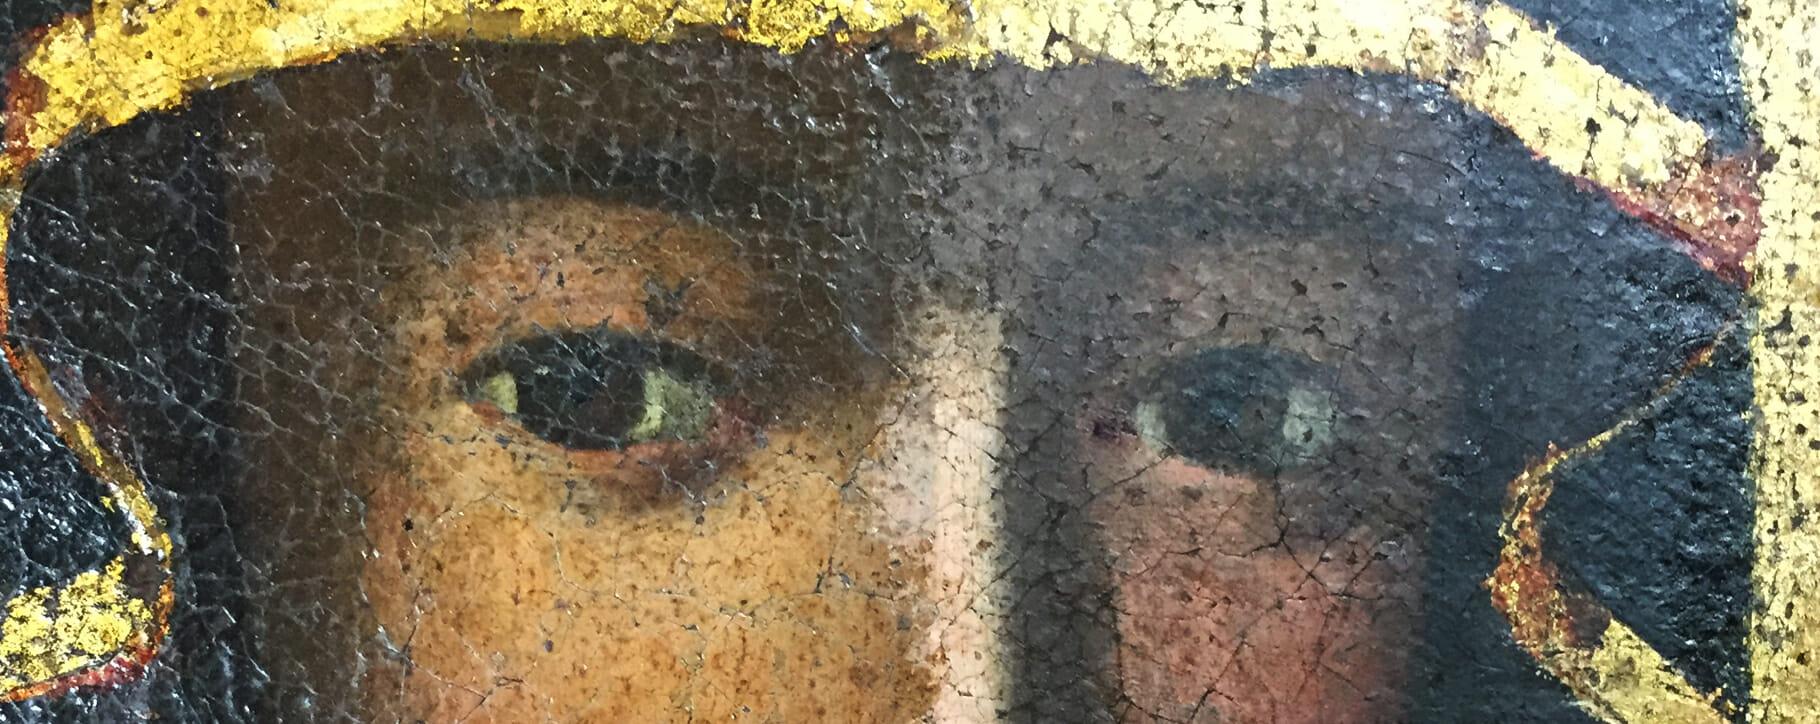 Virgin Mary Eyes Detail